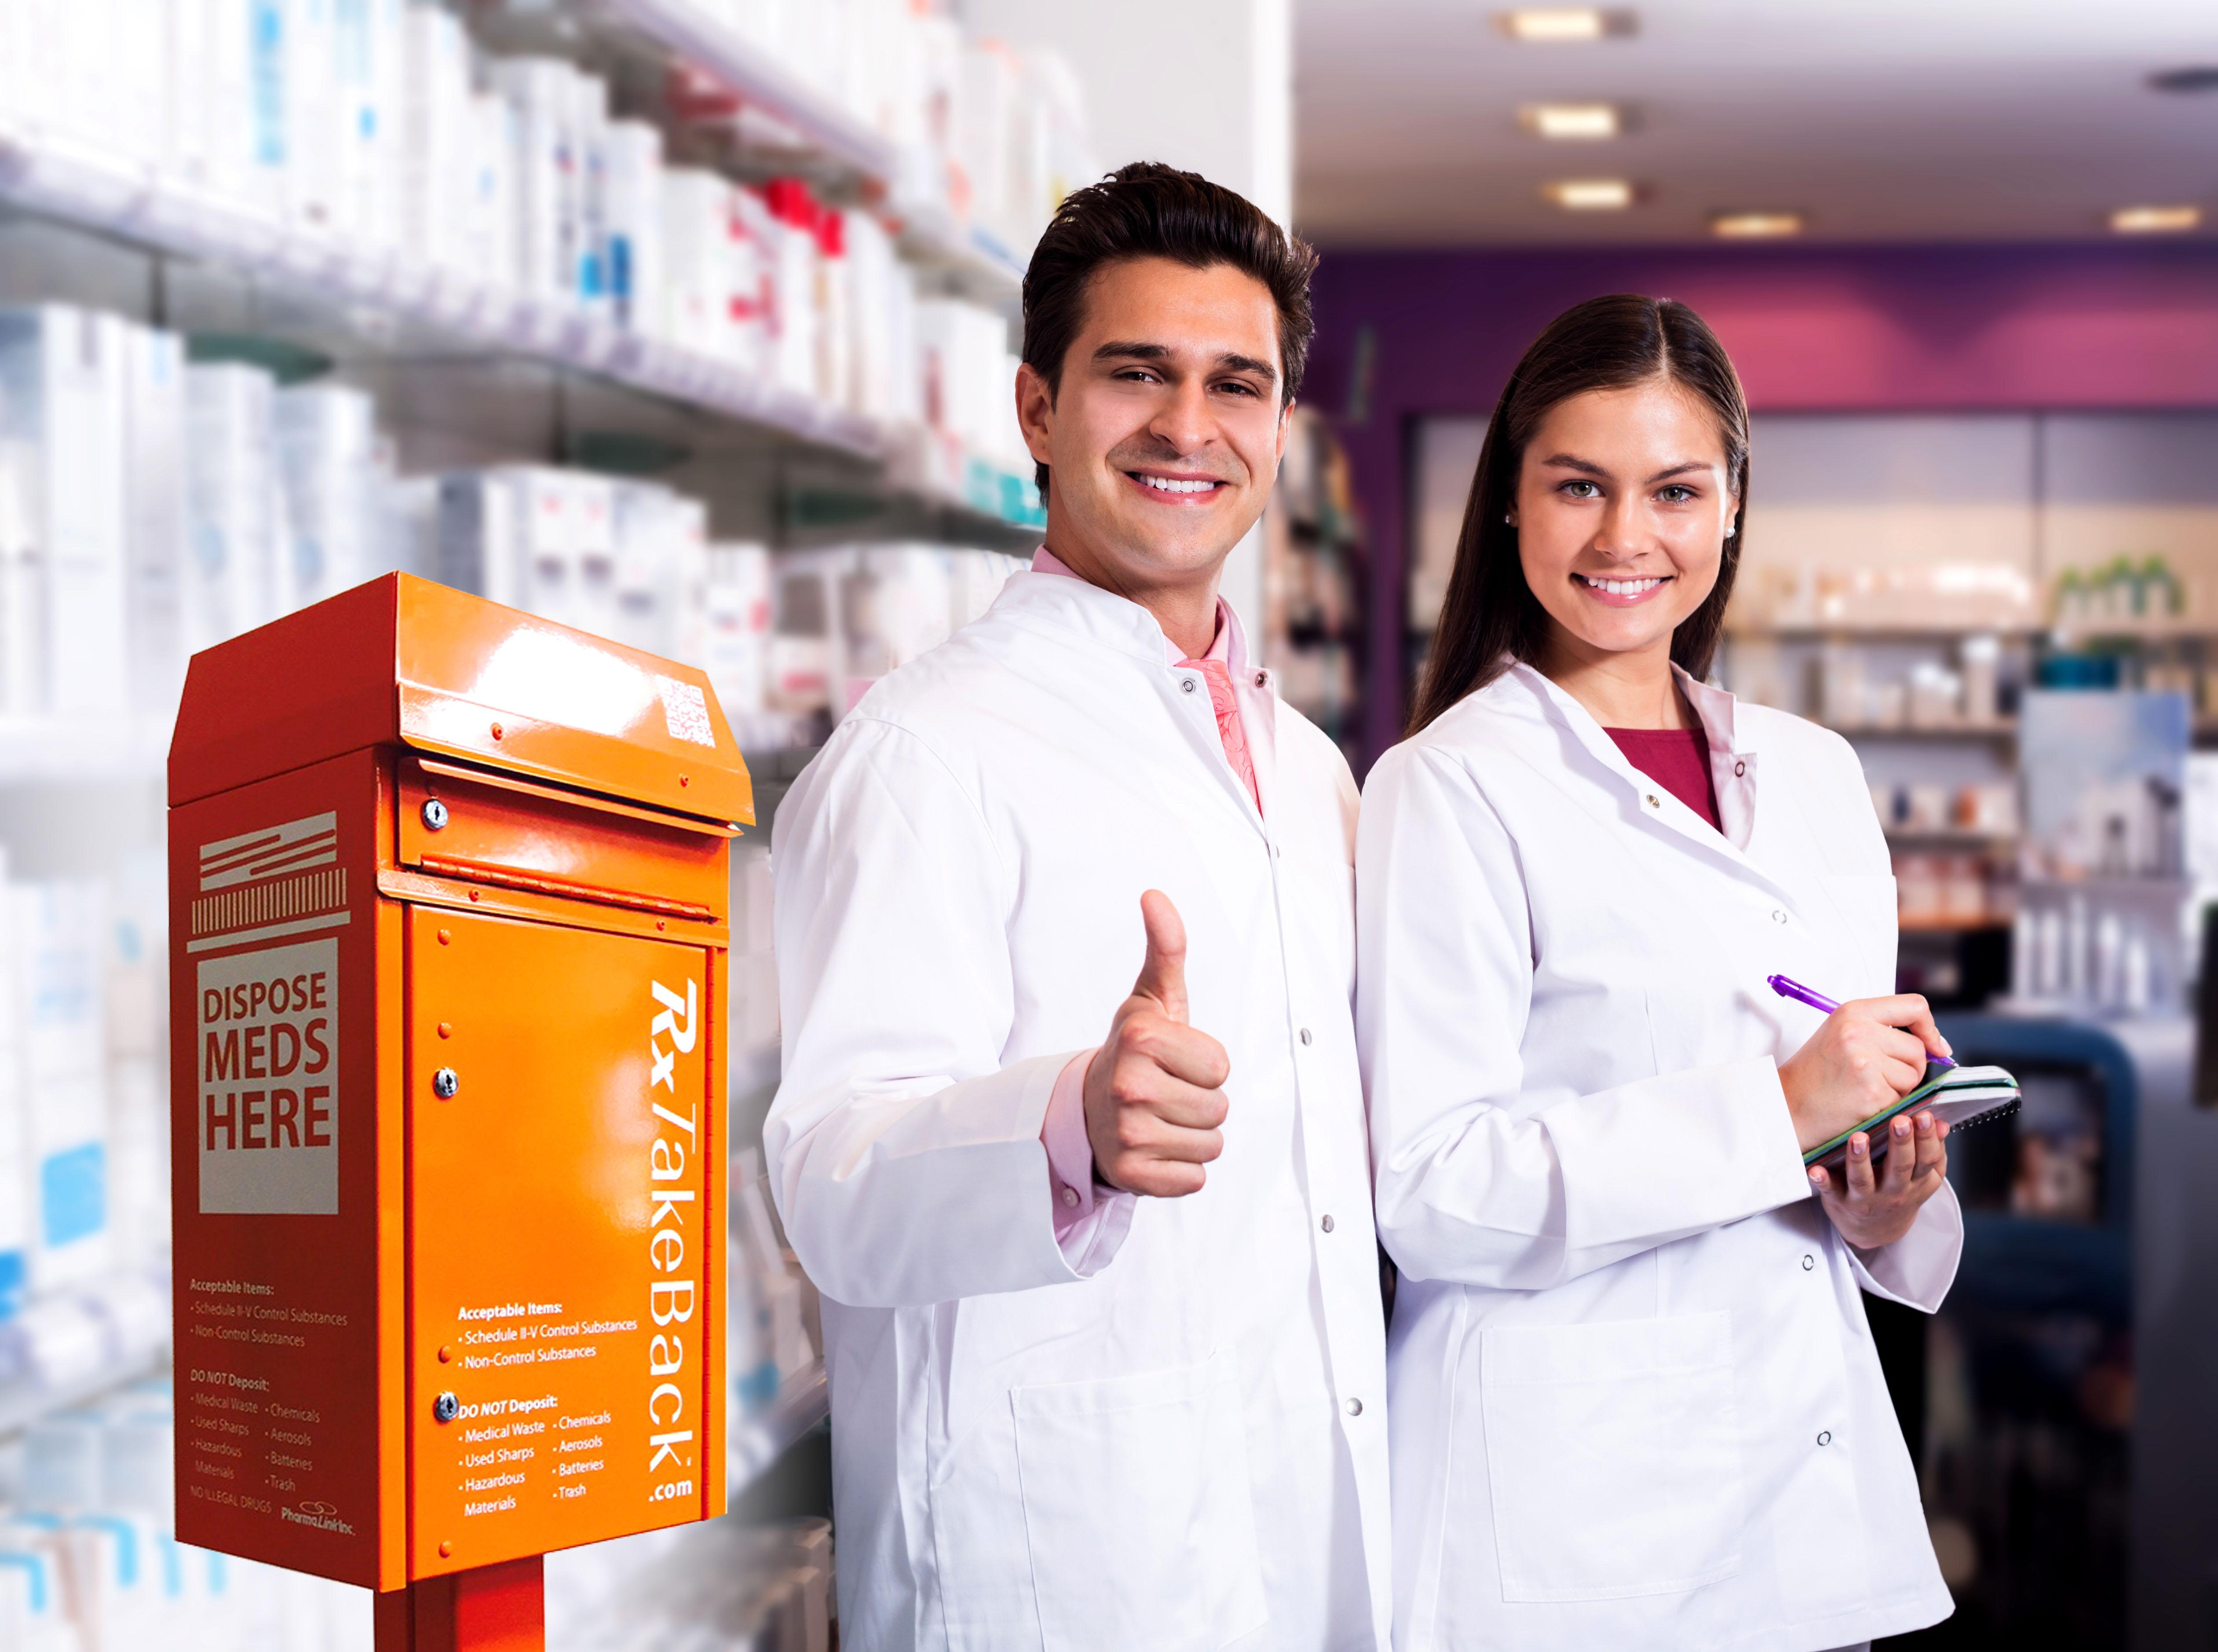 RxTakeBack kiosk Team